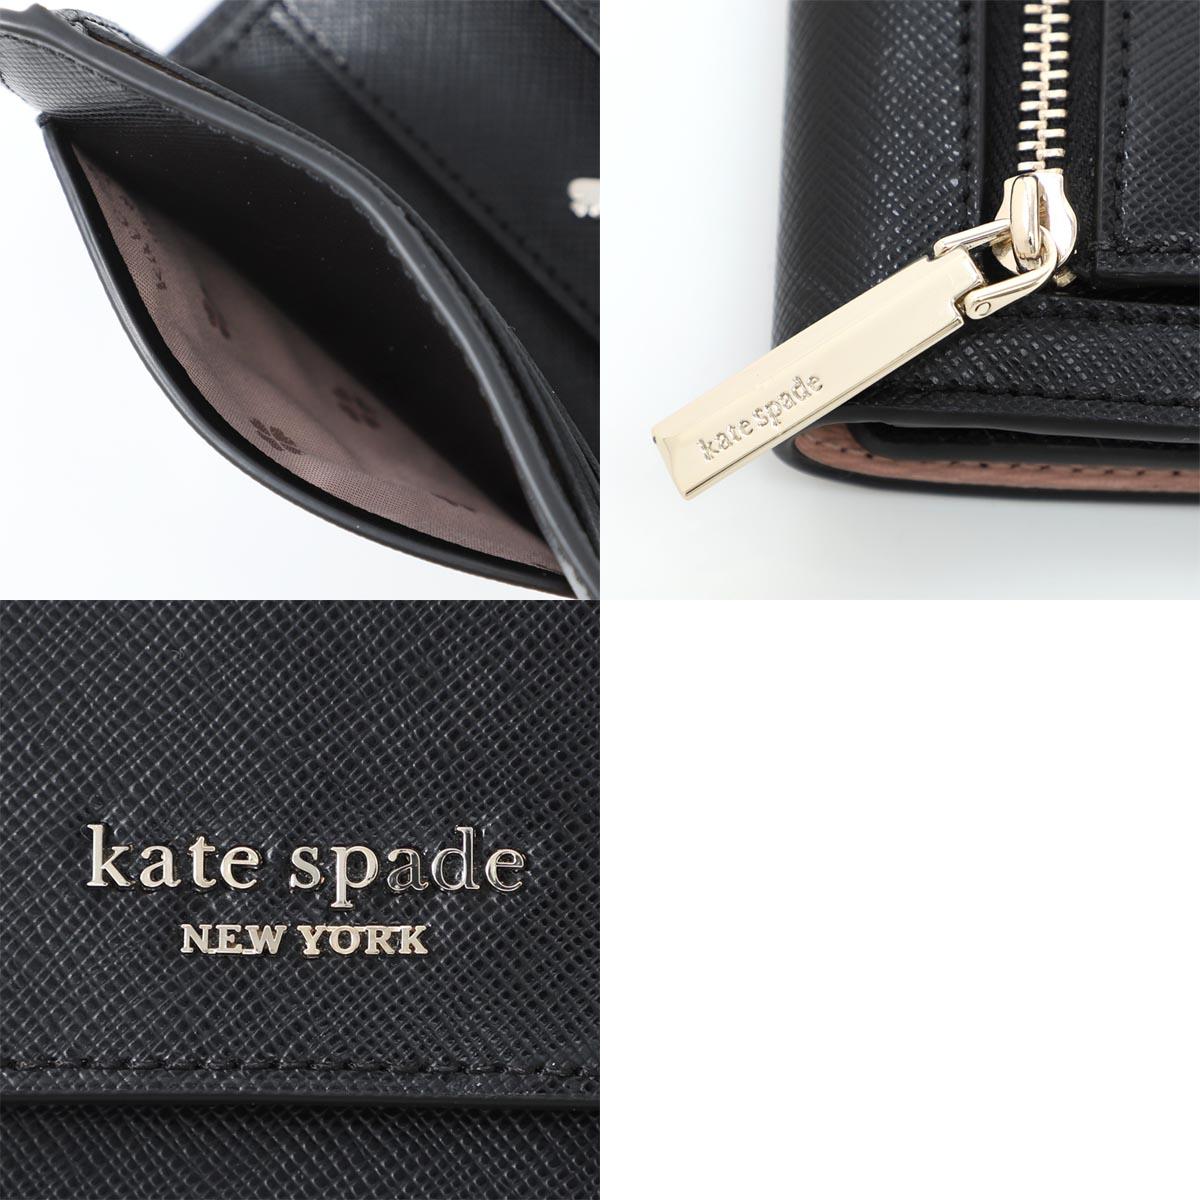 Kate Spade ケイトスペード 3つ折り財布 小銭入れ付き/SPENCER スペンサー レディース